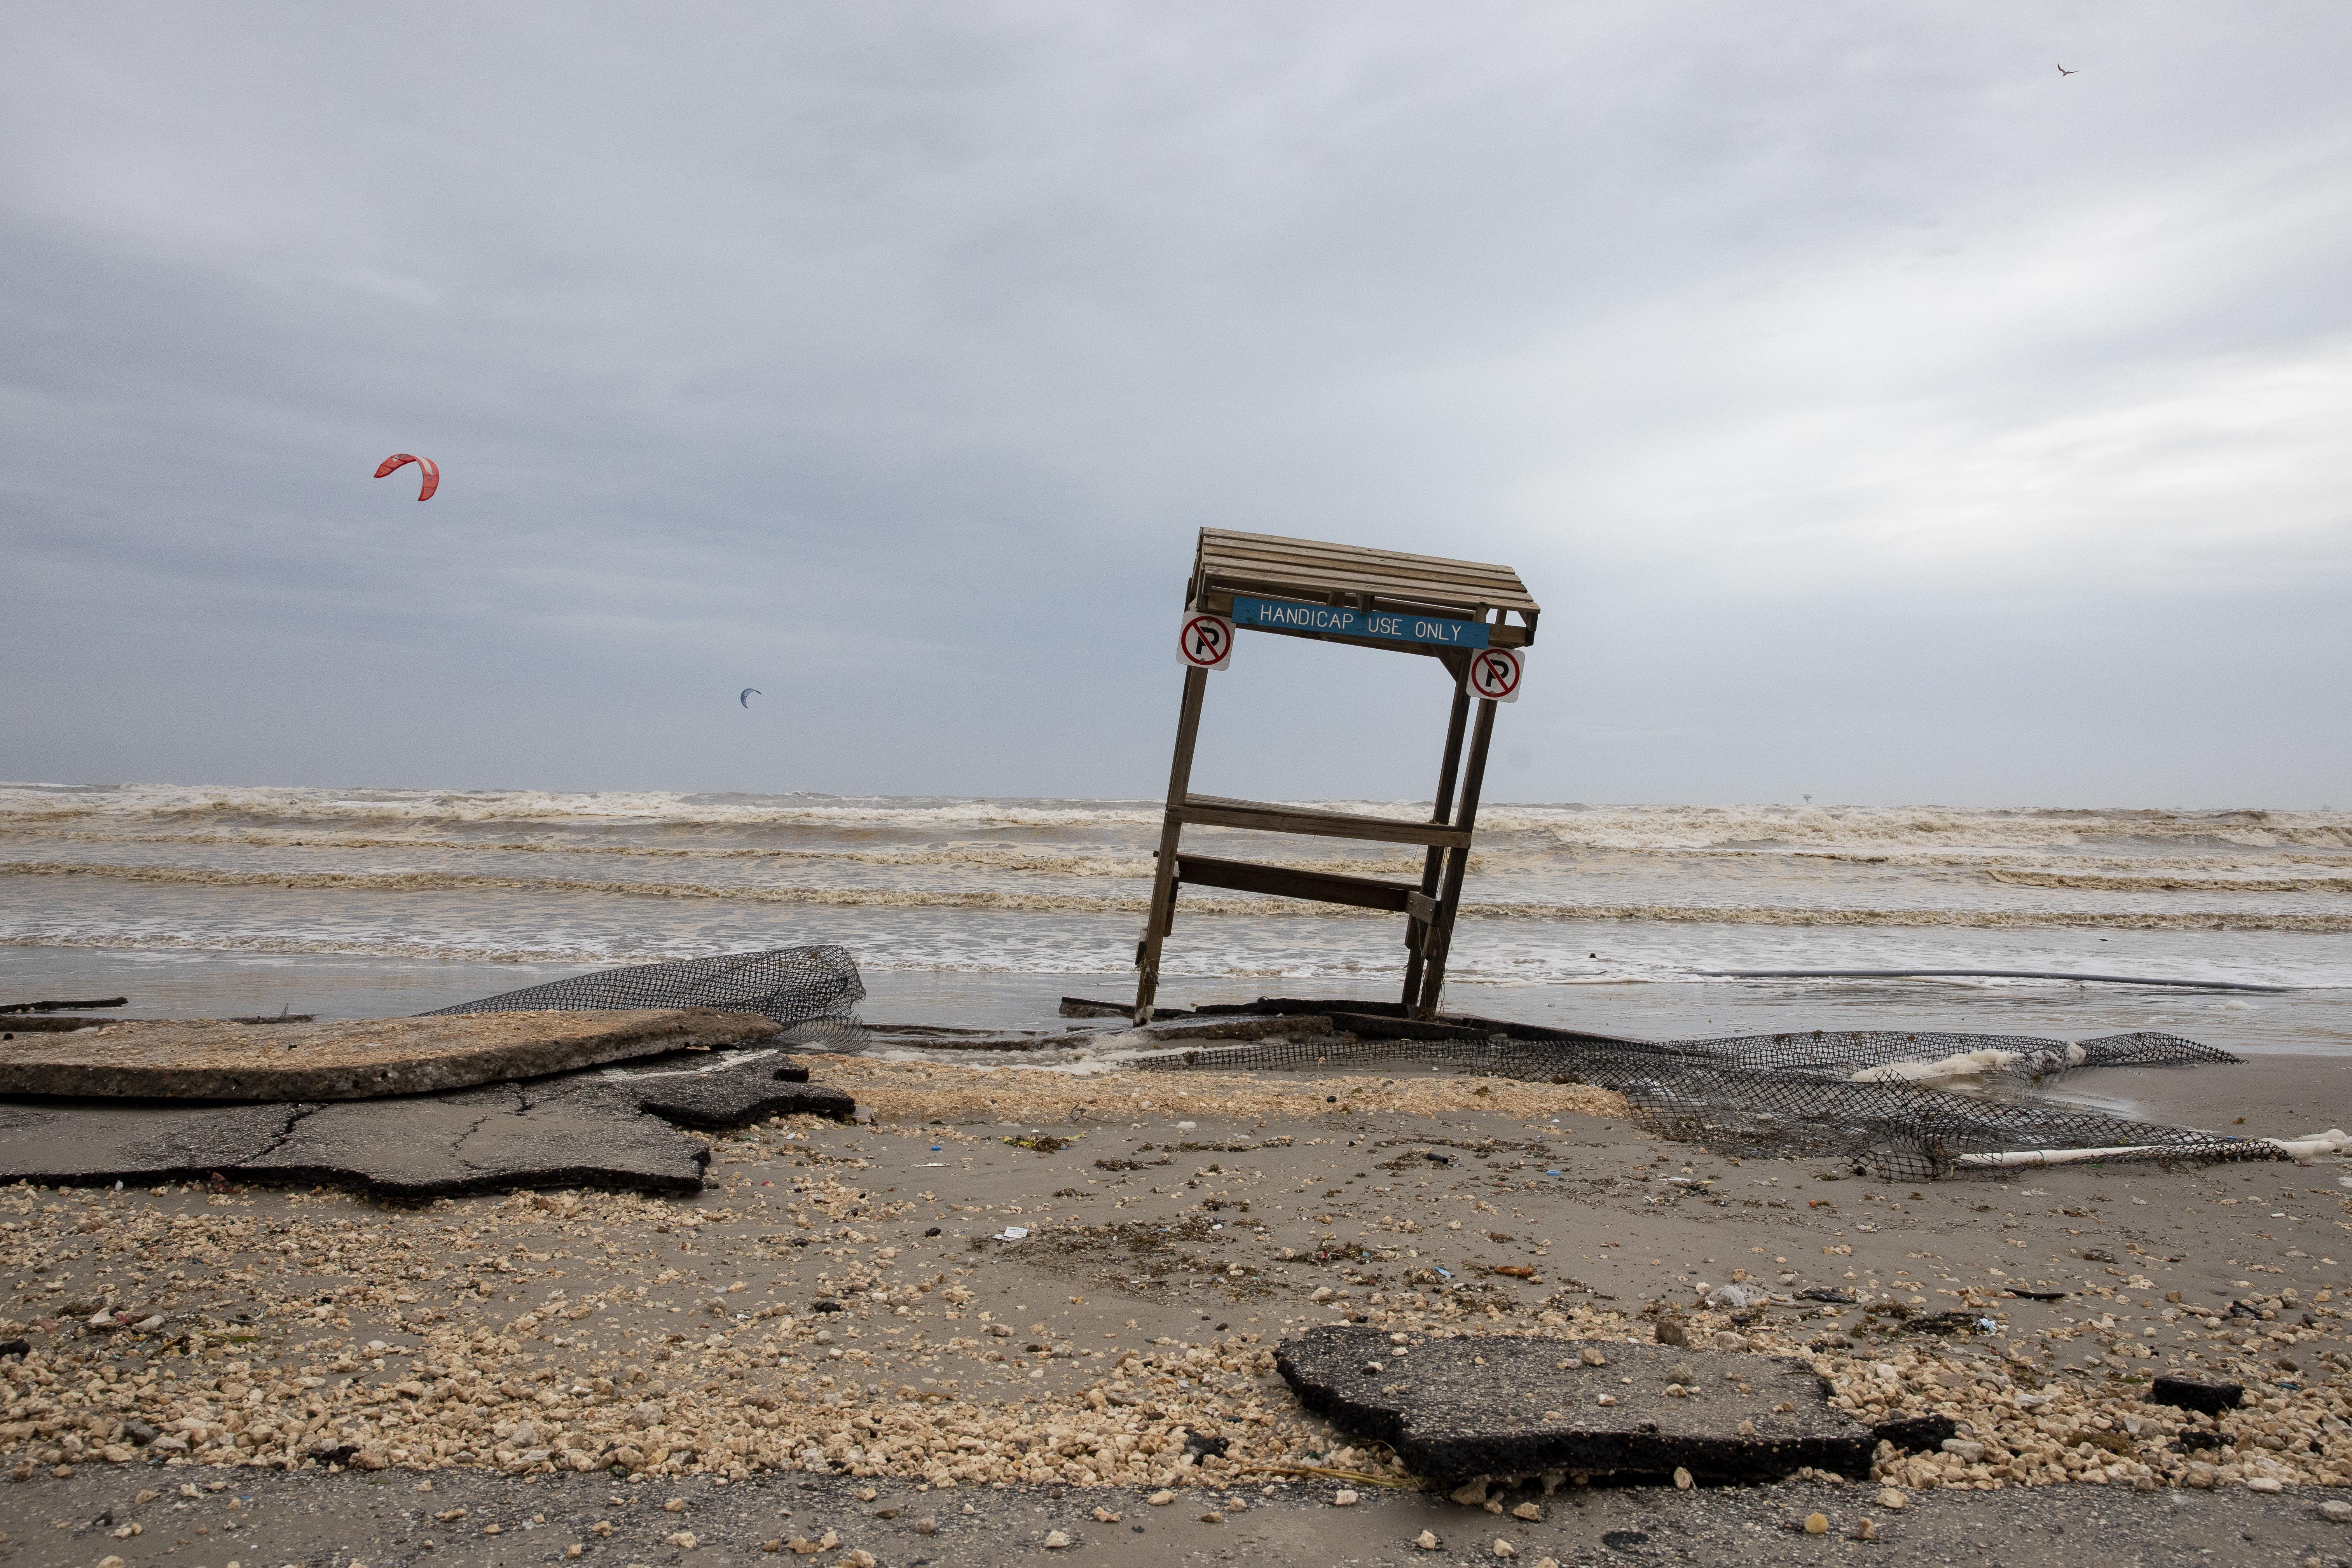 Una playa en Corpus Christi tras el paso de la tormenta (Courtney Sacco/Corpus Christi Caller-Times via AP)